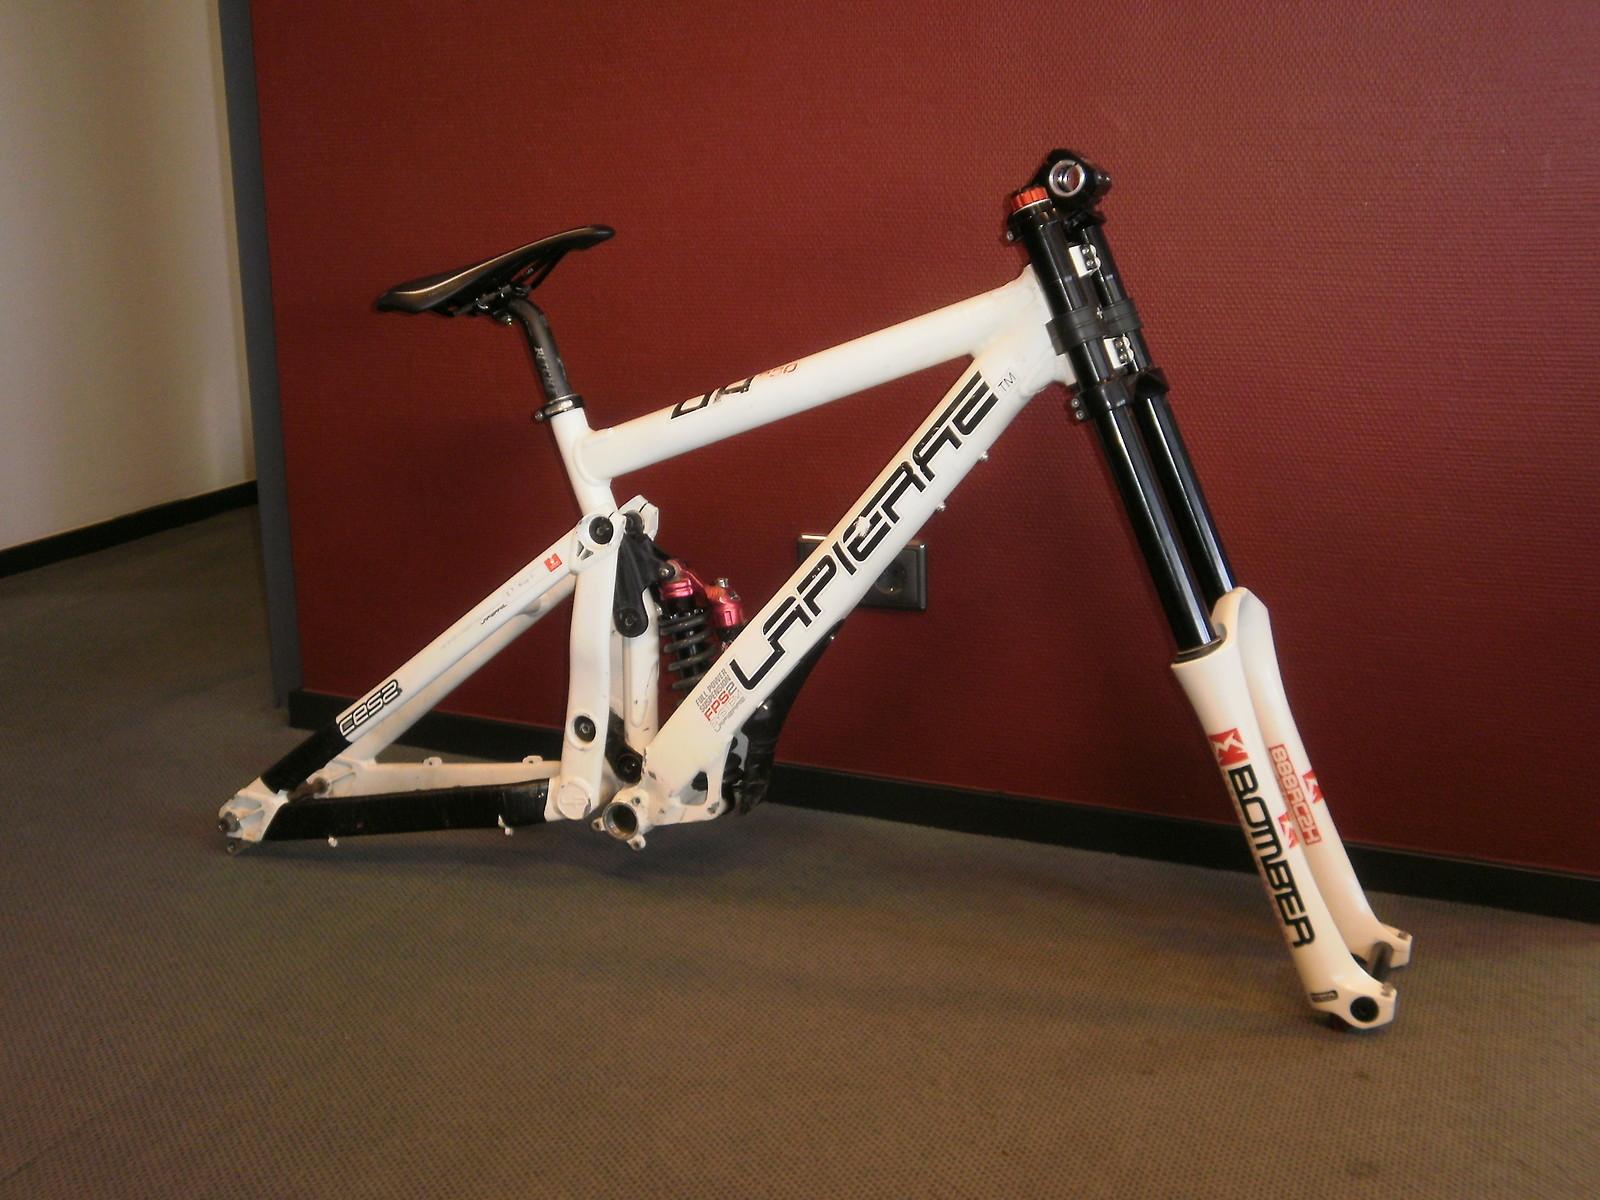 P2240297 - sherlock - Mountain Biking Pictures - Vital MTB